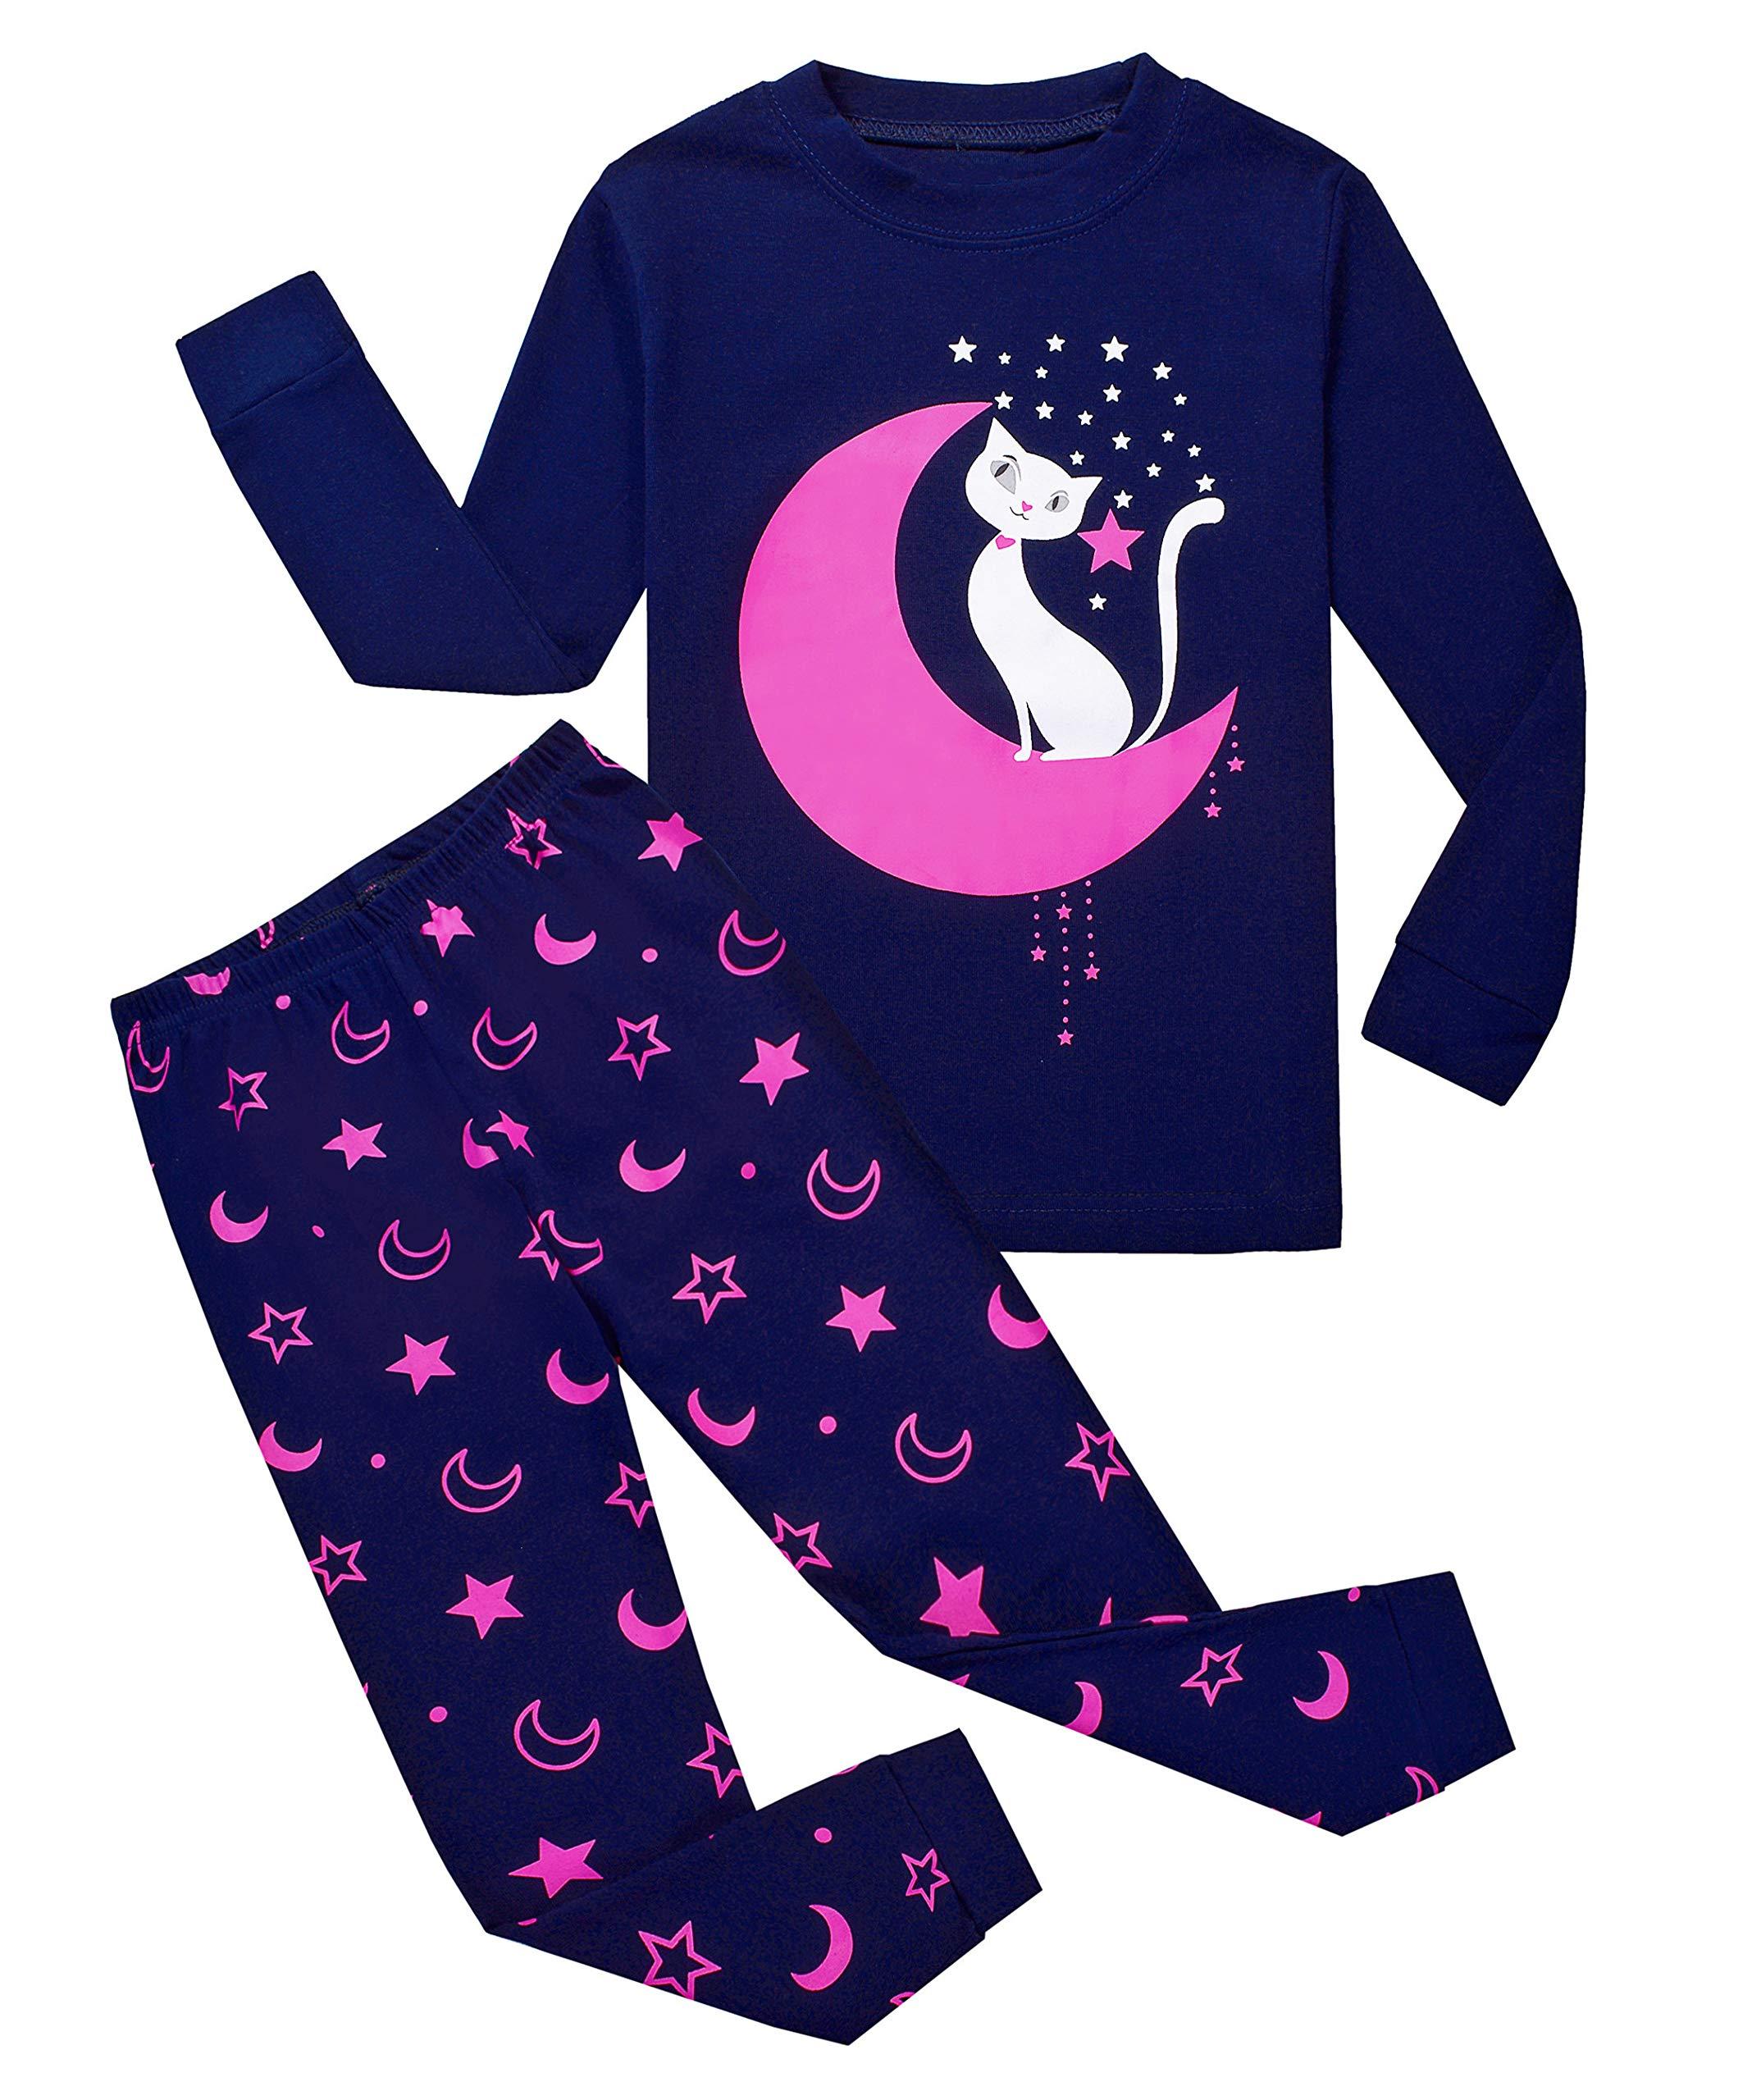 Garsumiss Girls Pajamas Owl Sleepwear Toddler Clothes Cotton Little Kids Pjs (5 Years, Purple/Cat)